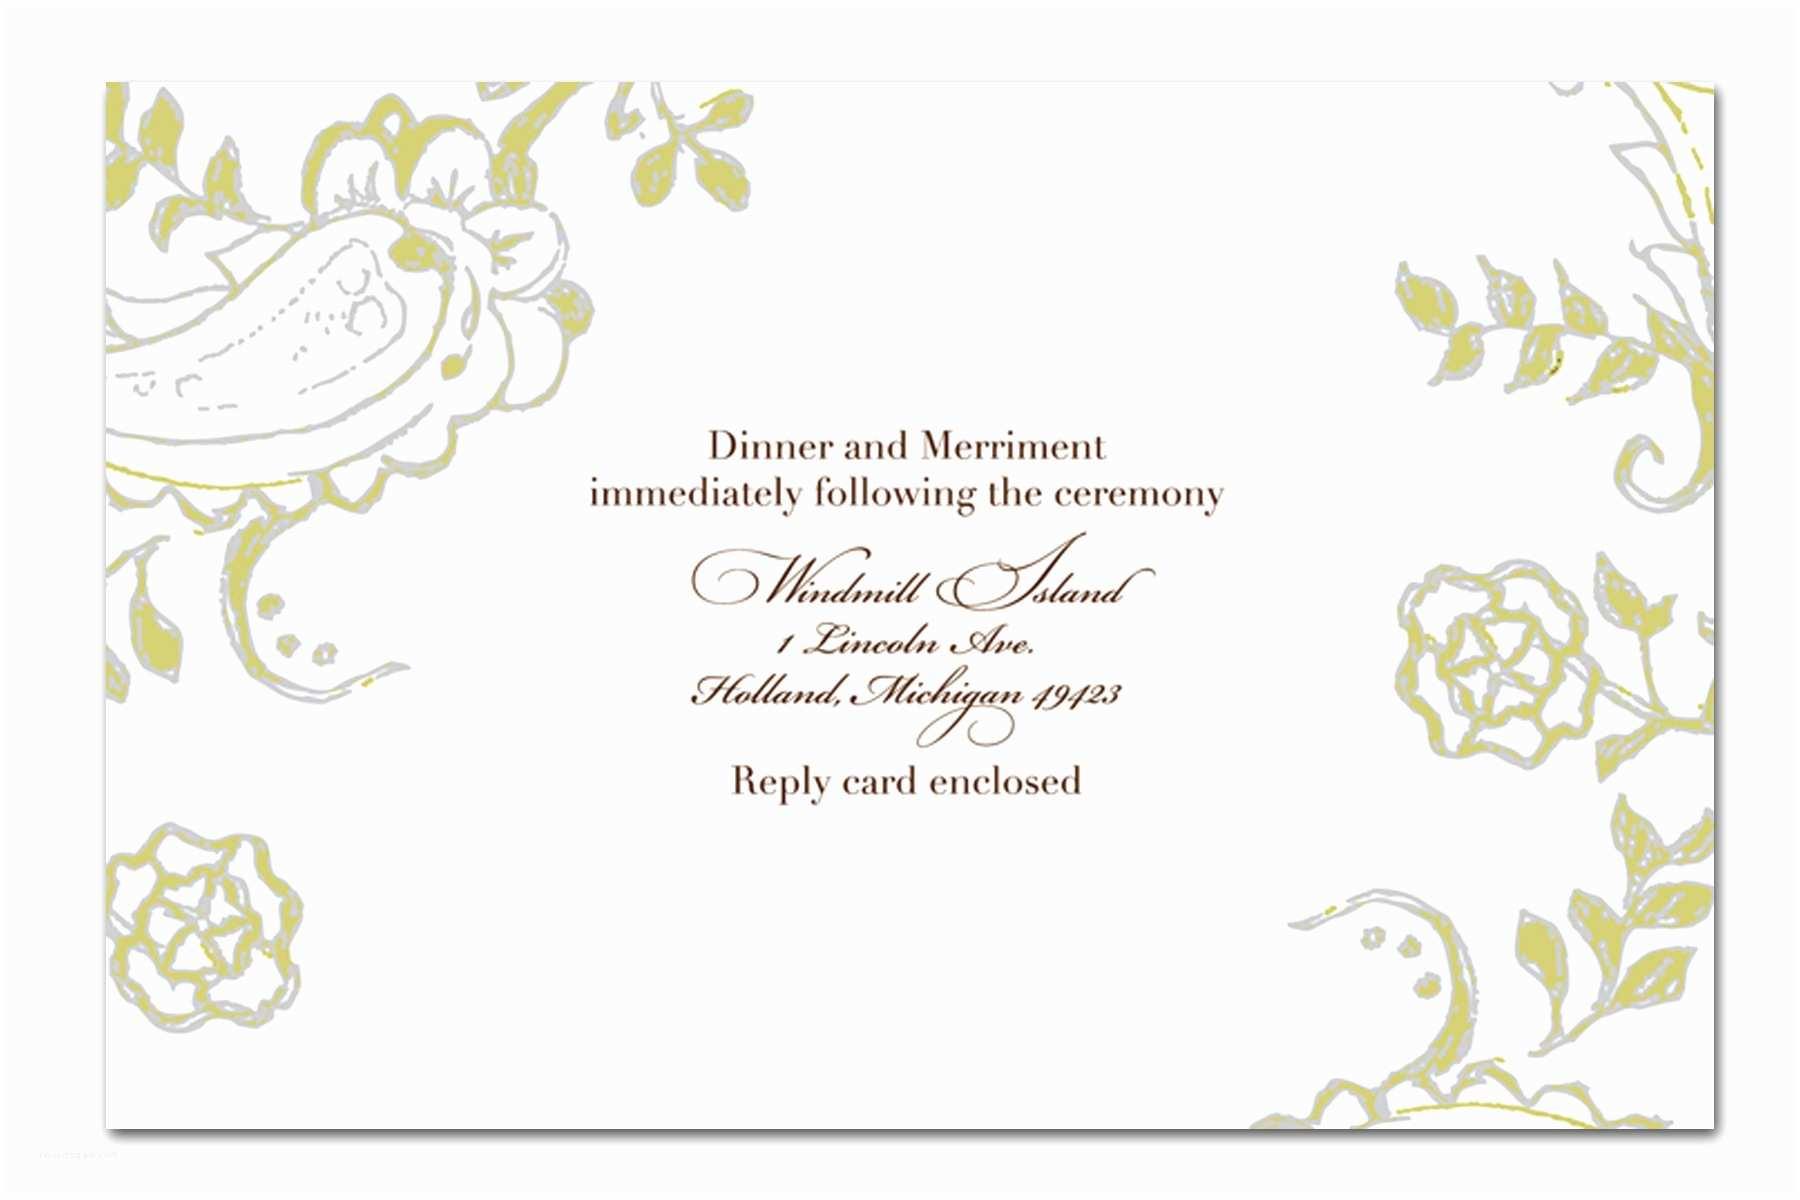 Wedding Invitation Designs Free Handmade Wedding Invitation Template Design